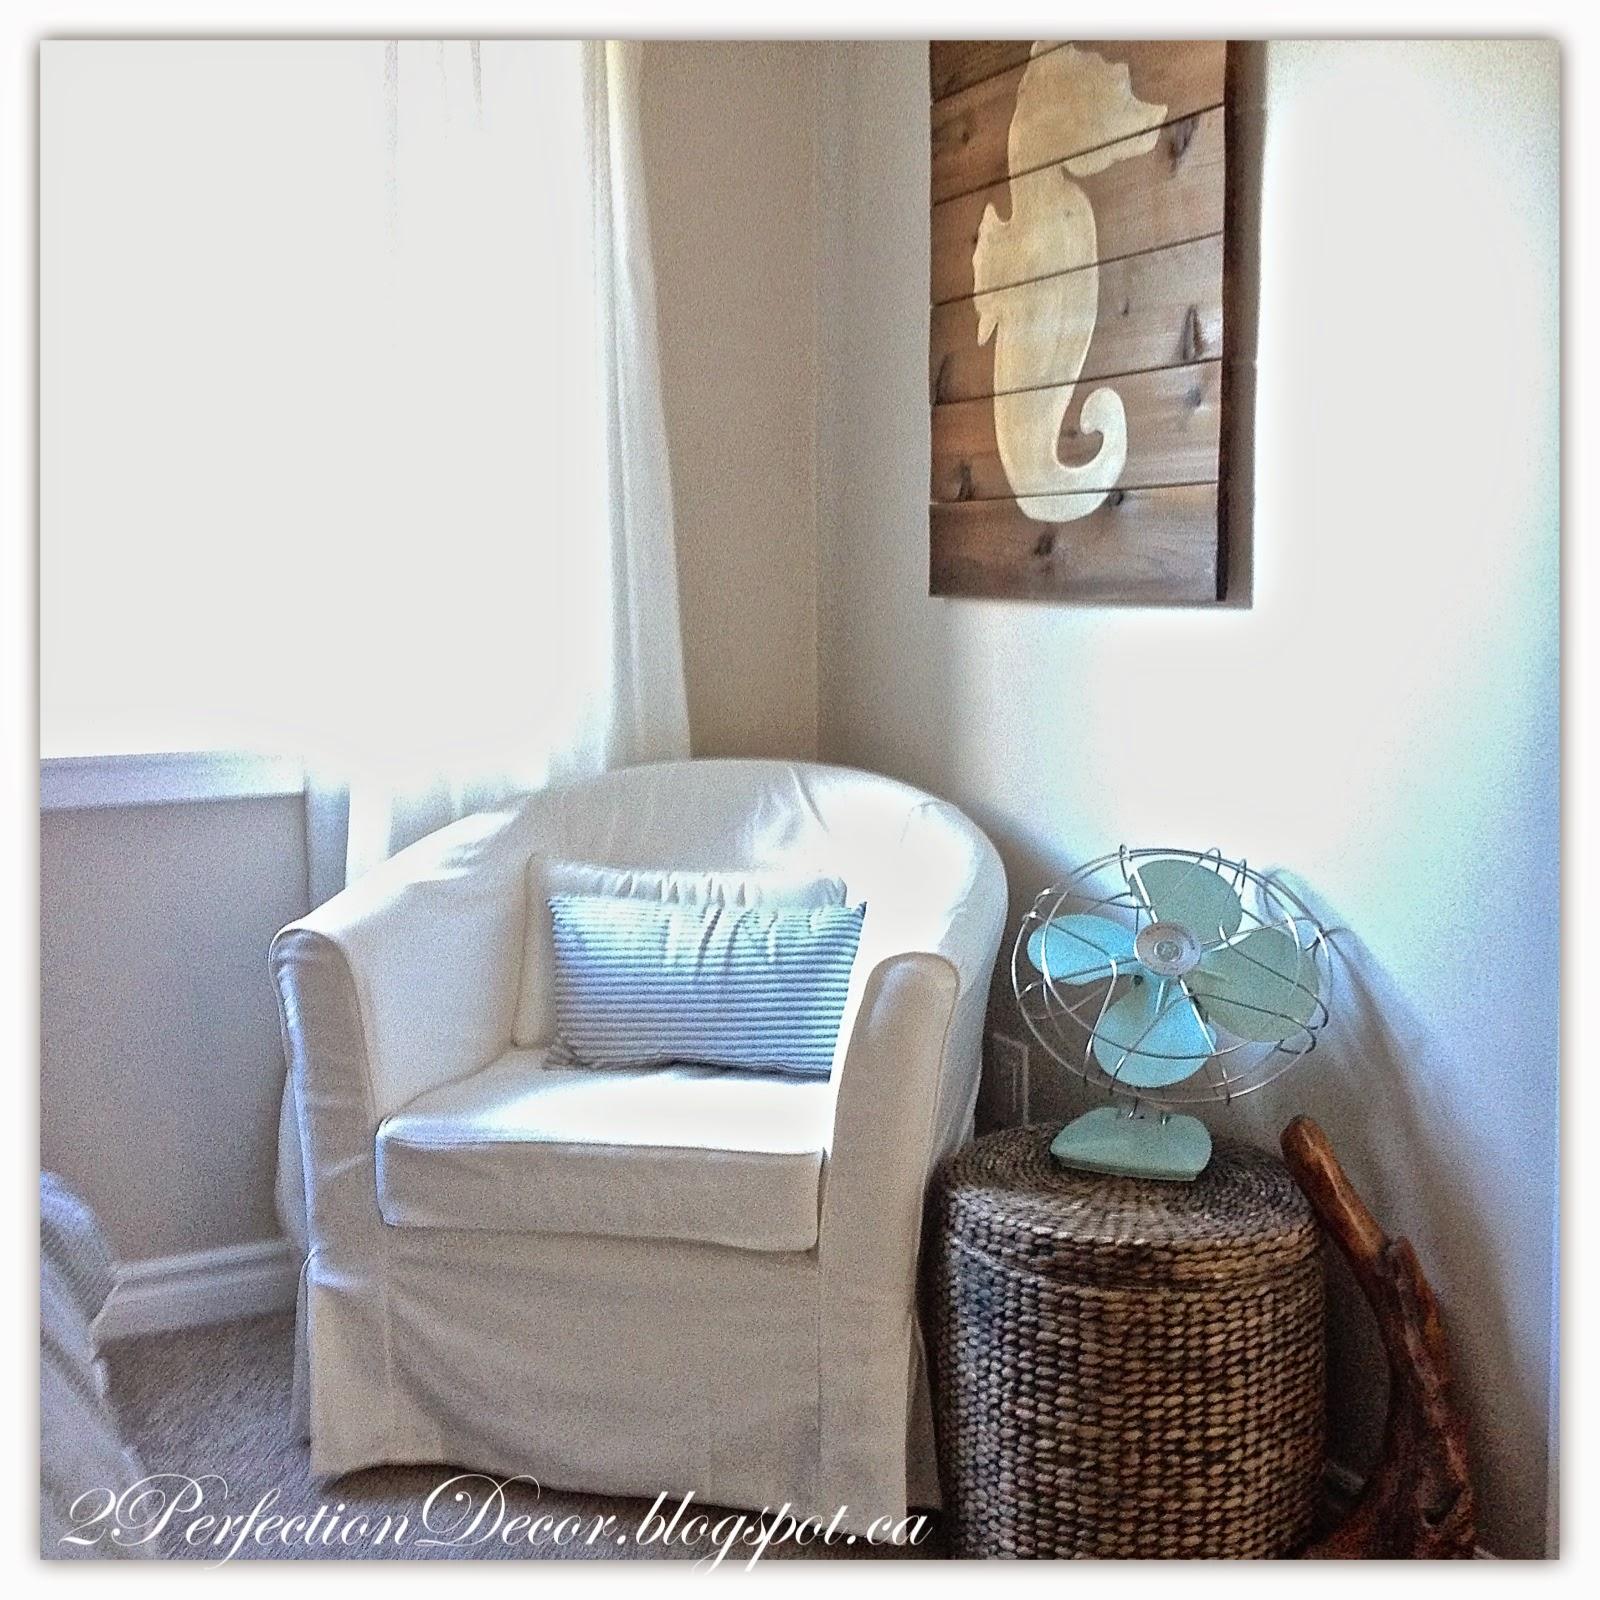 Basement Bedroom: 2Perfection Decor: Our Basement Guest Bedroom Reveal